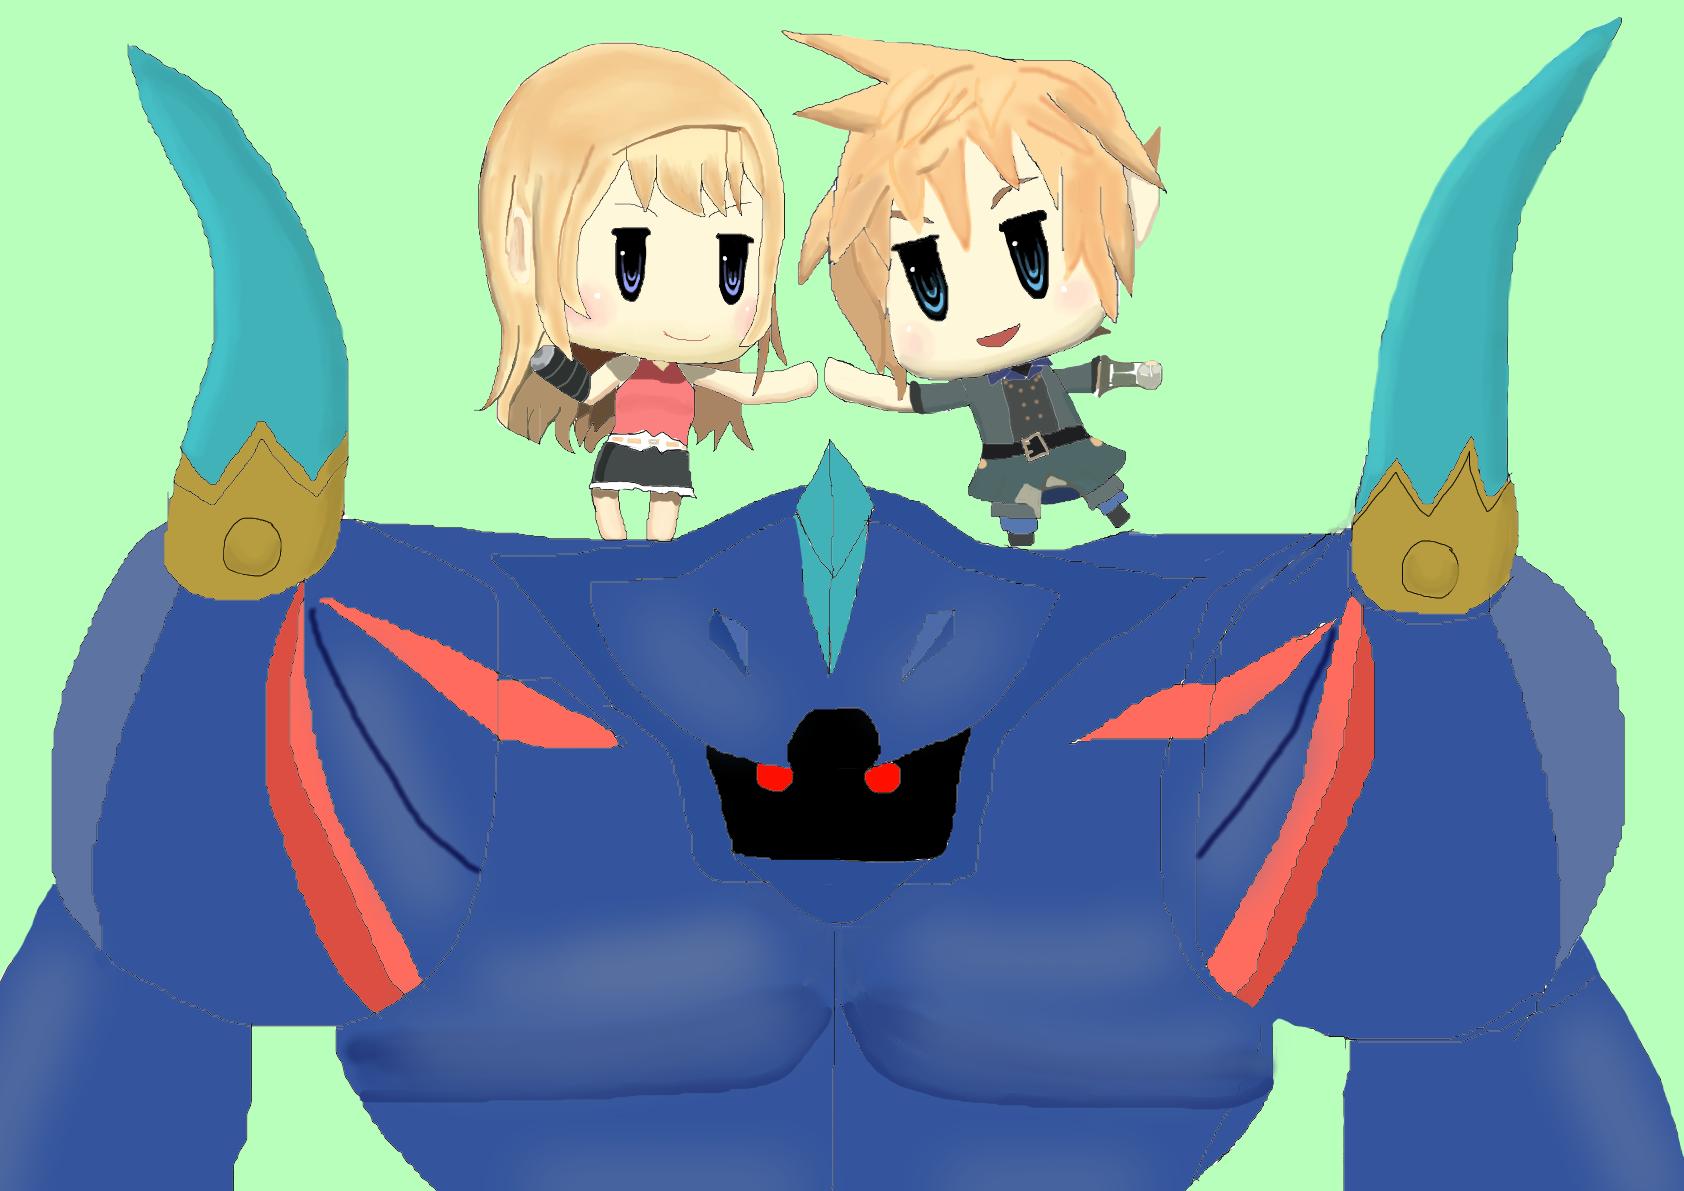 World of Final Fantasy Fanart